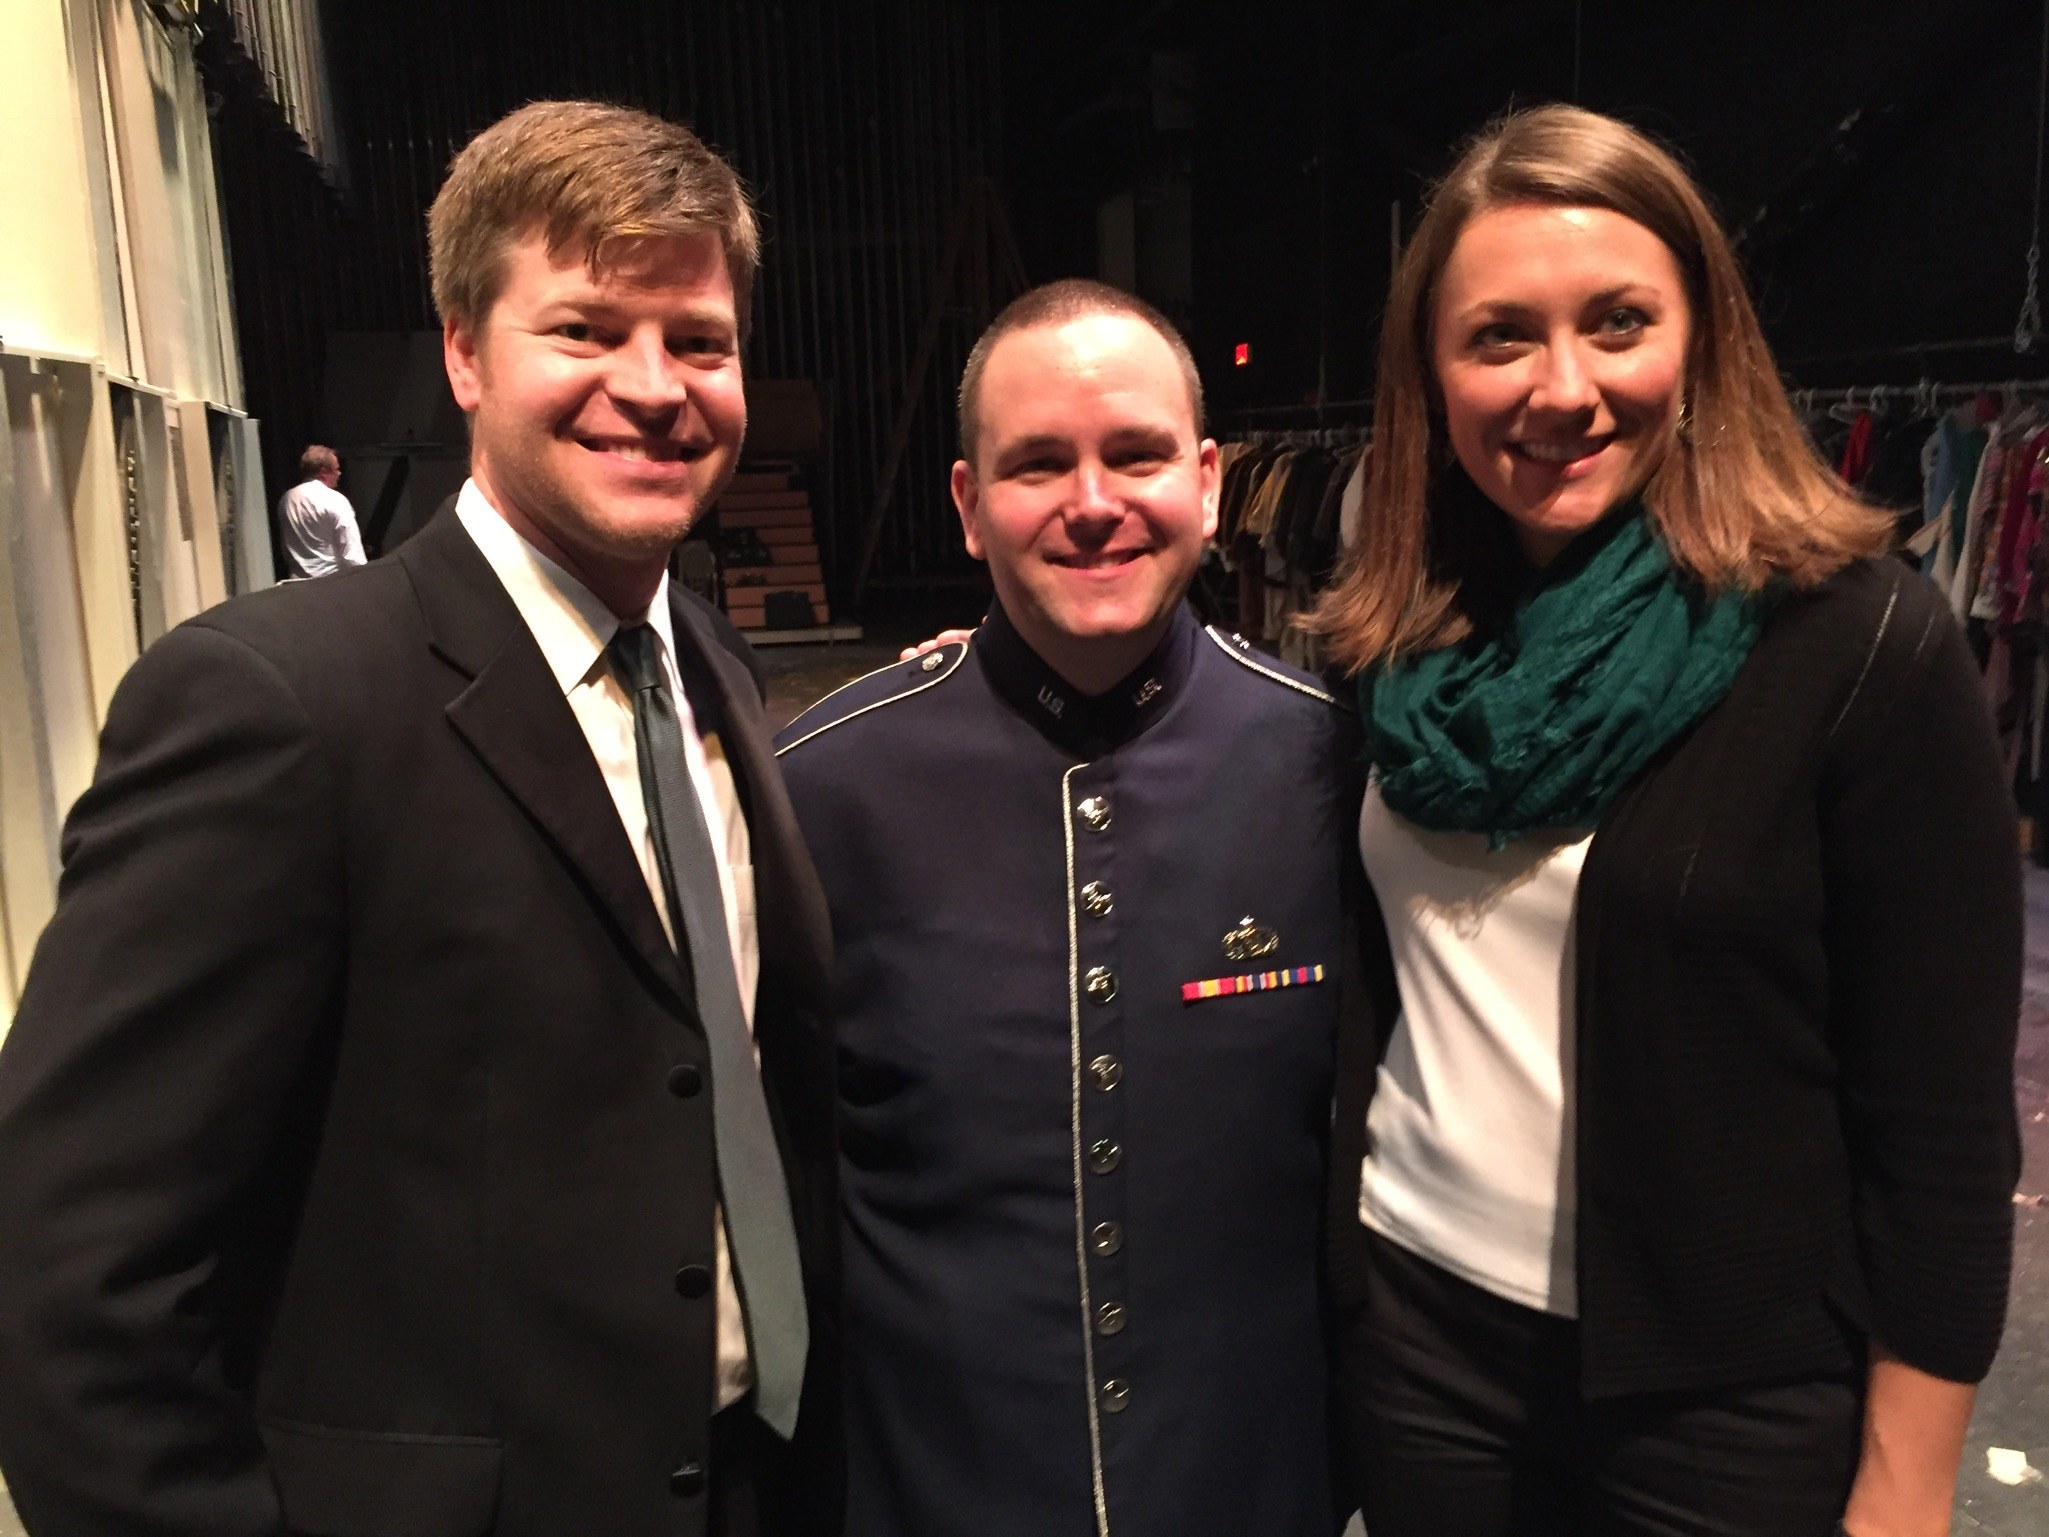 Post performance pic with Brandon Jones and Laura Ketchum.